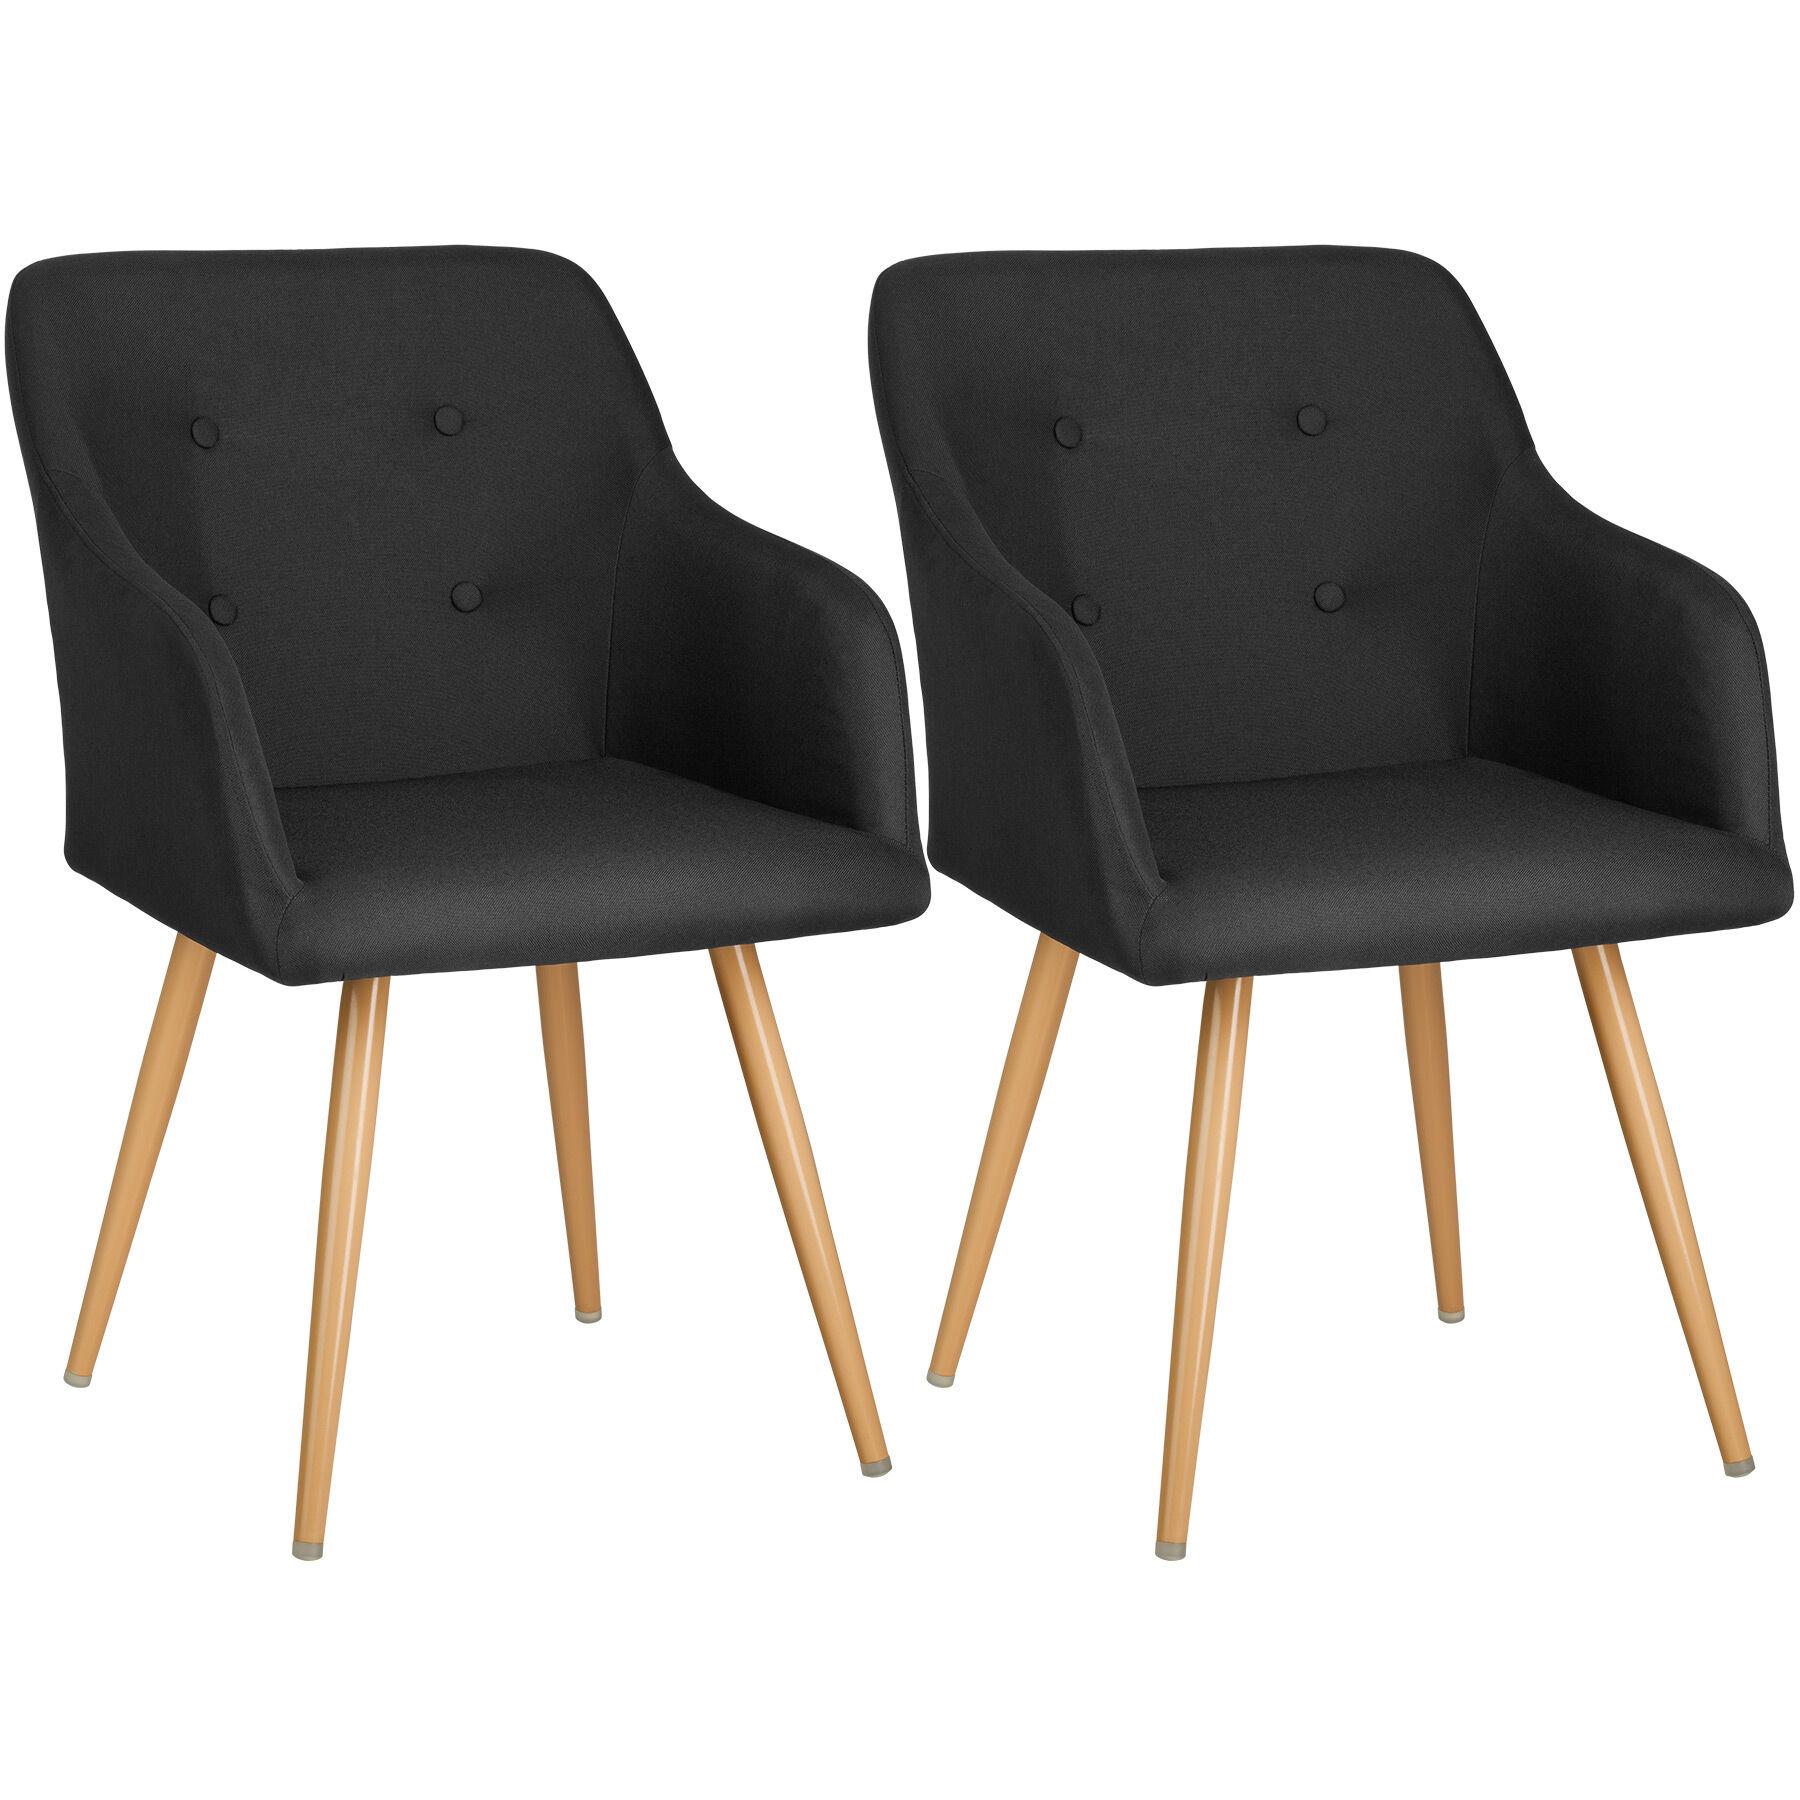 tectake 2 Chairs Tanja - black